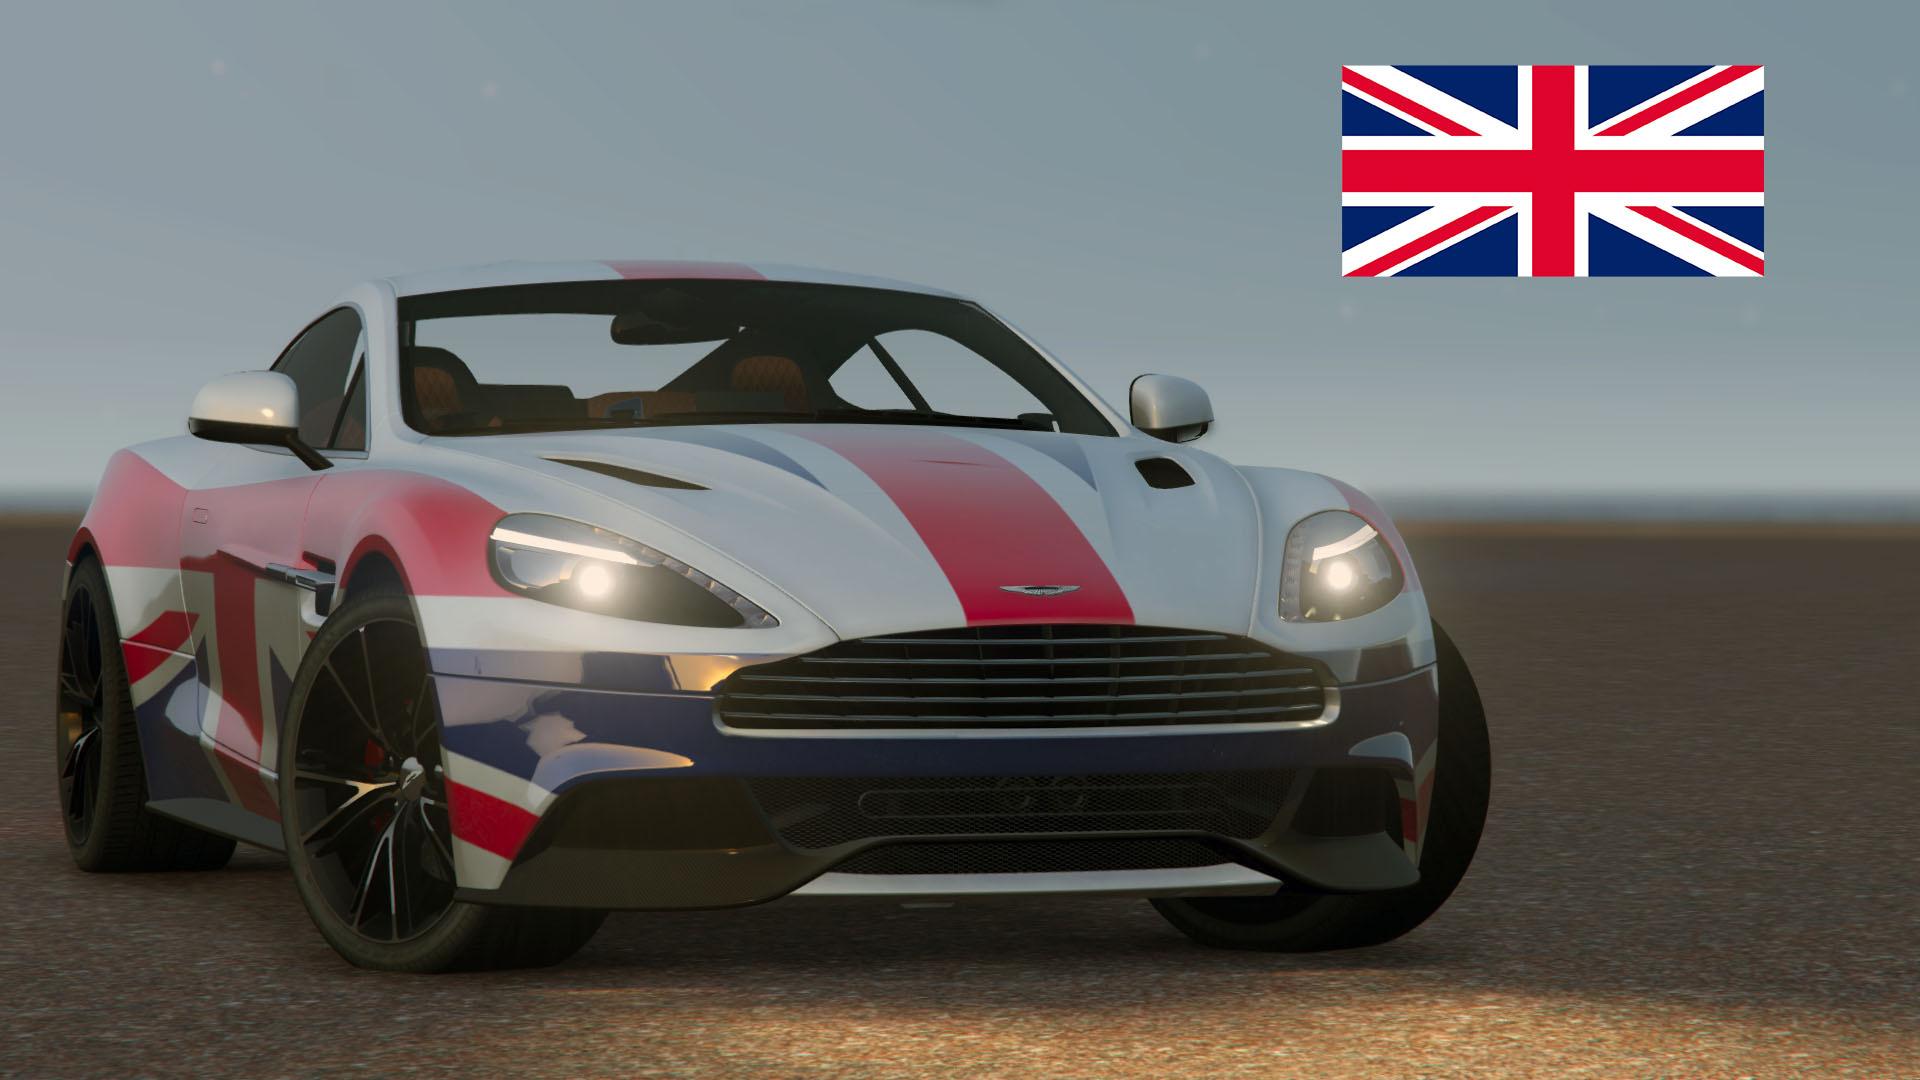 2013 Aston Martin Vanquish ]Union Jack Livery GTA5 Mods